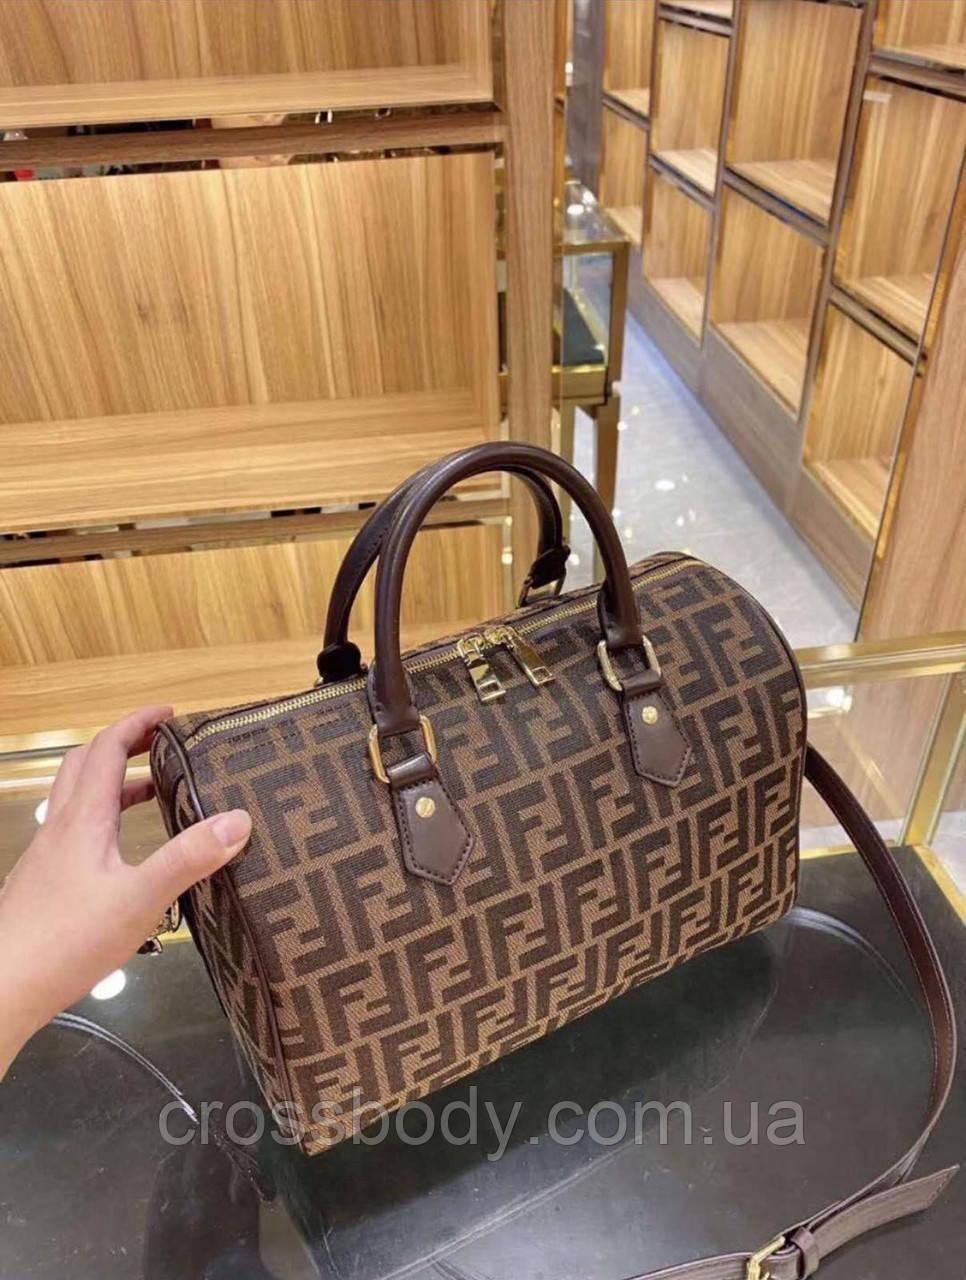 Louis Vuitton в стиле без коробки